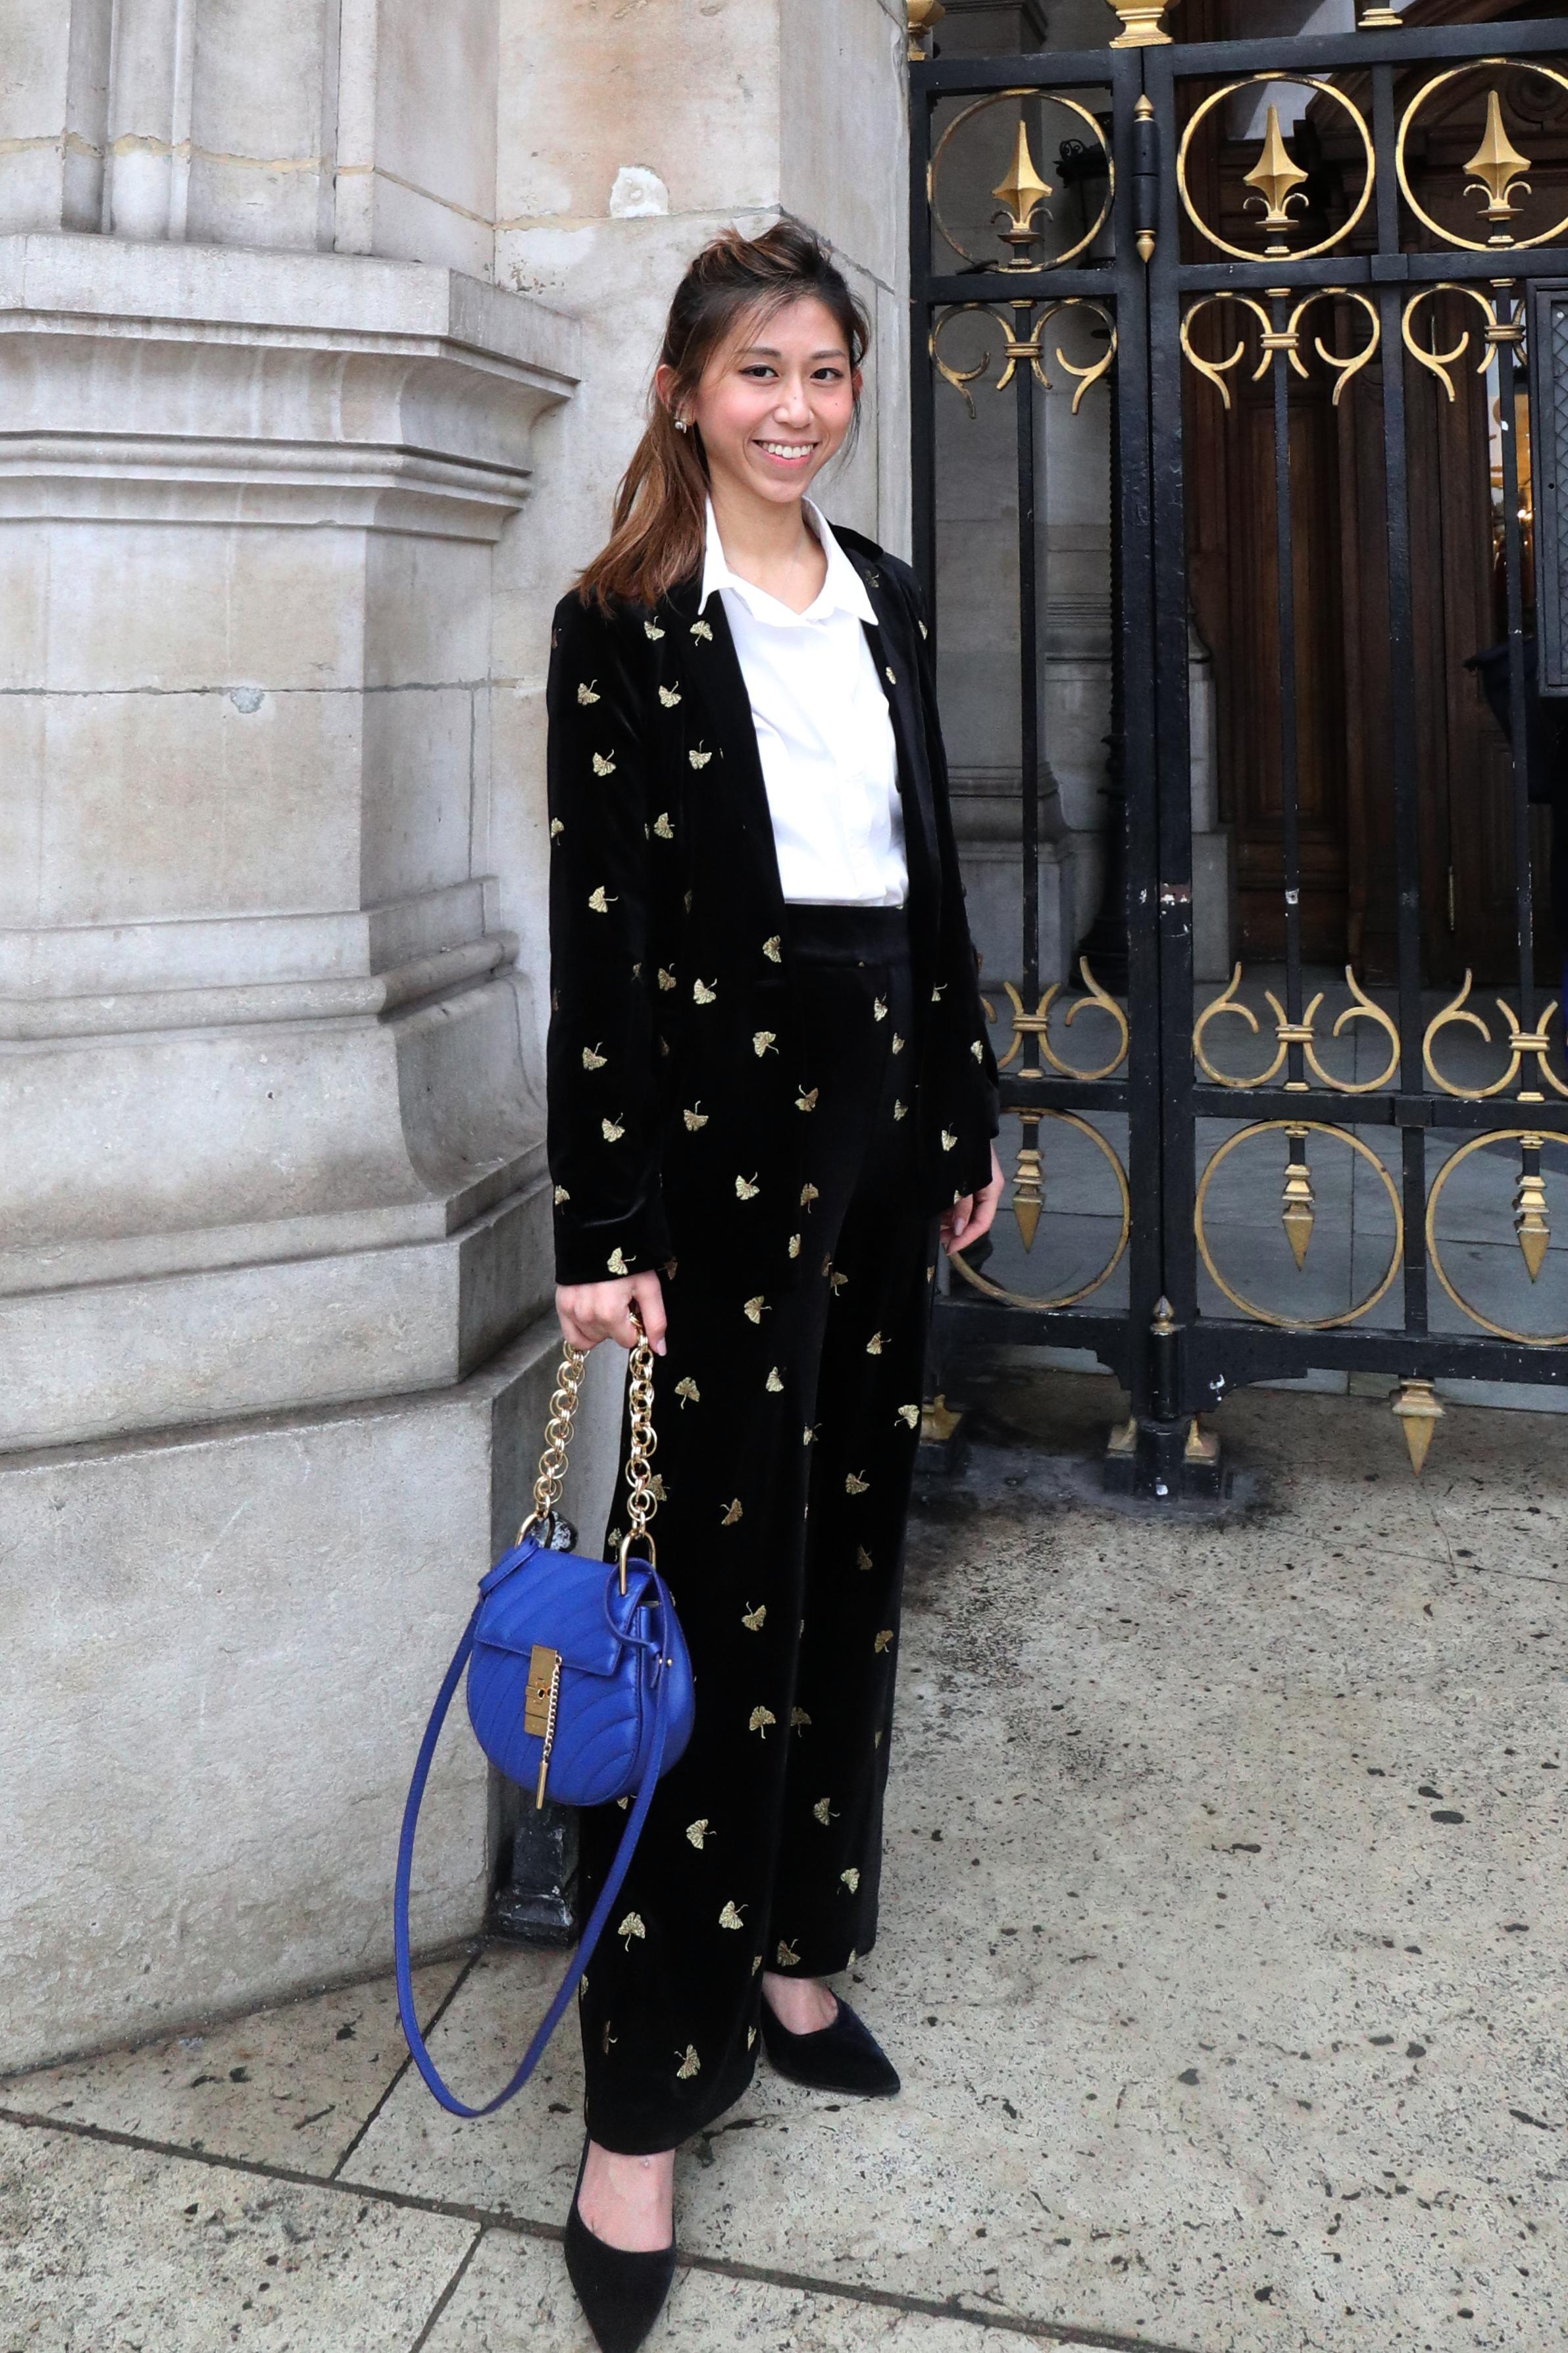 - Suit Top & Bottom: & OTHER STORIES embroidered velvet blazerTop: COS white shirtShoes: Prada velvet pumpsBag: CHLOÉ Drew Bijou Majesty Blue Leather